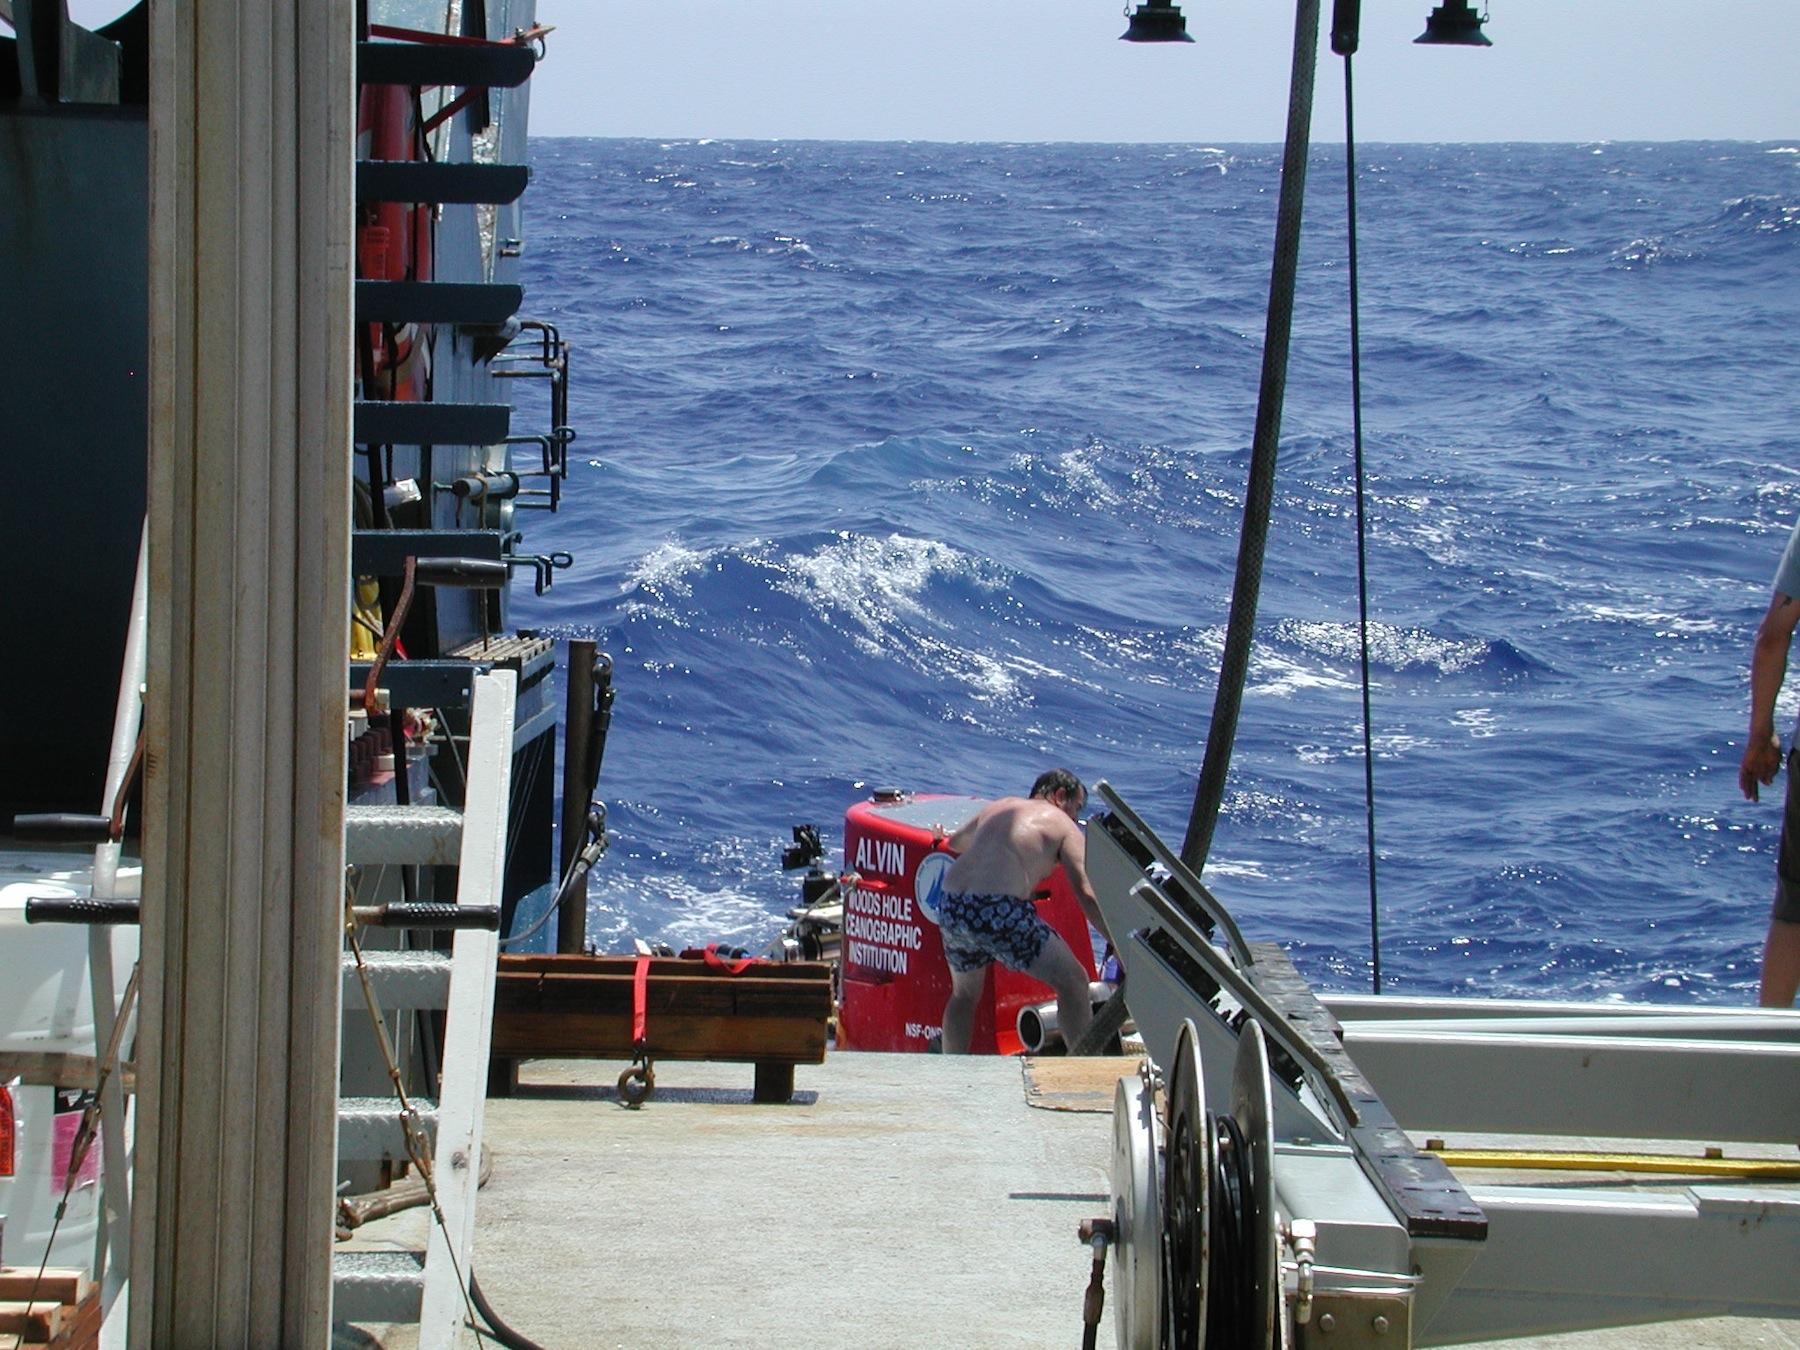 9-Alvin Pick Up Seas 3.JPG